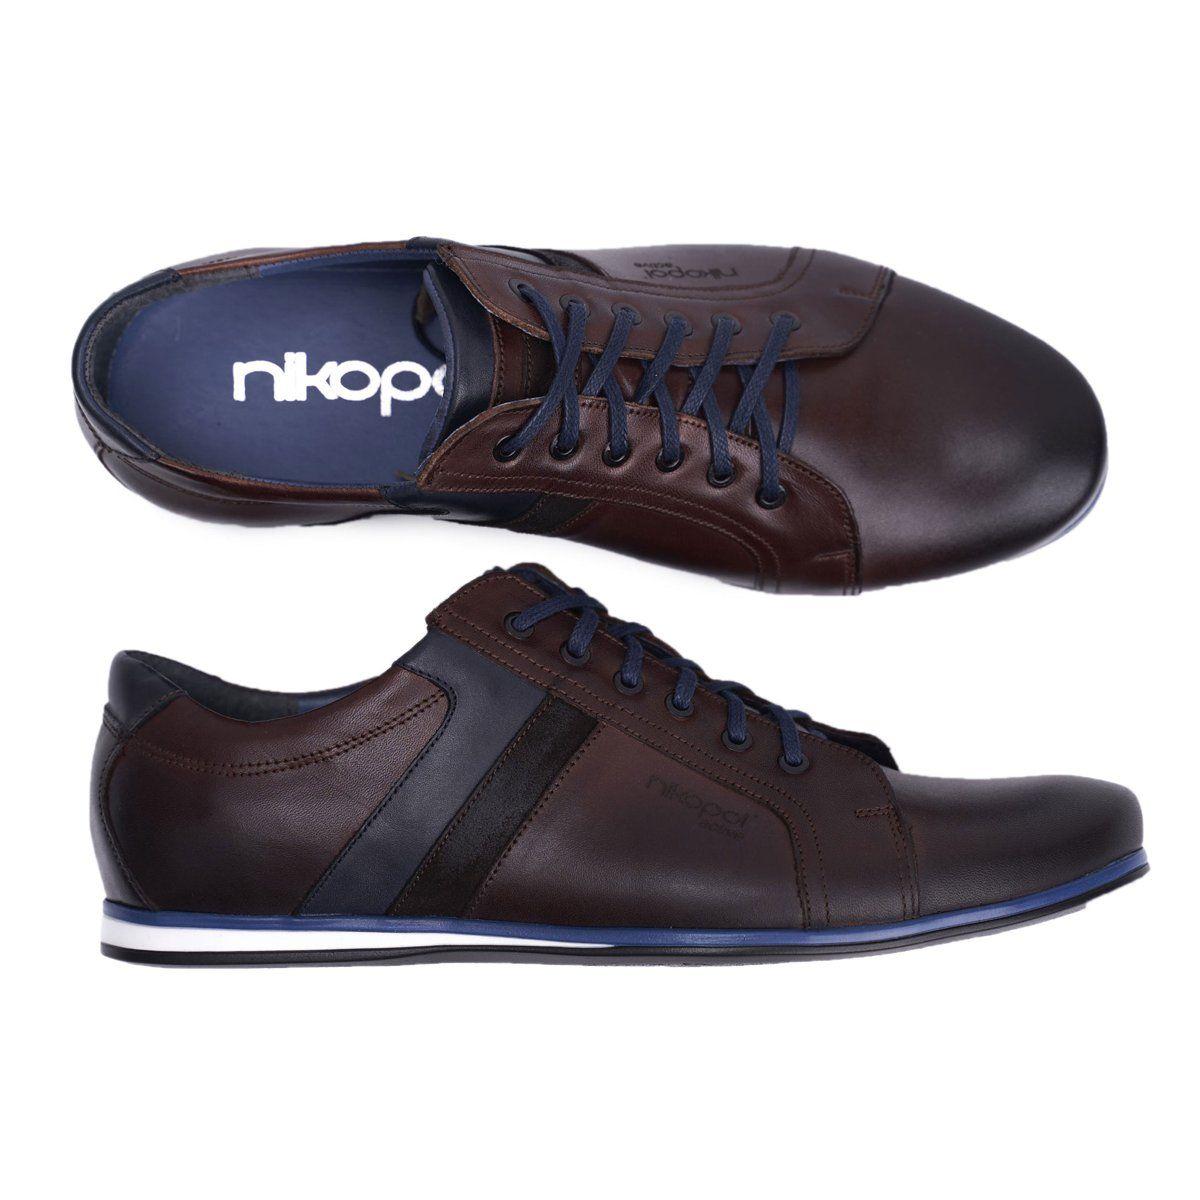 Polbuty Meskie Casual Skorzane Nikopol Brazowe 1721 Shoes Mens All Black Sneakers Fashion Shoes